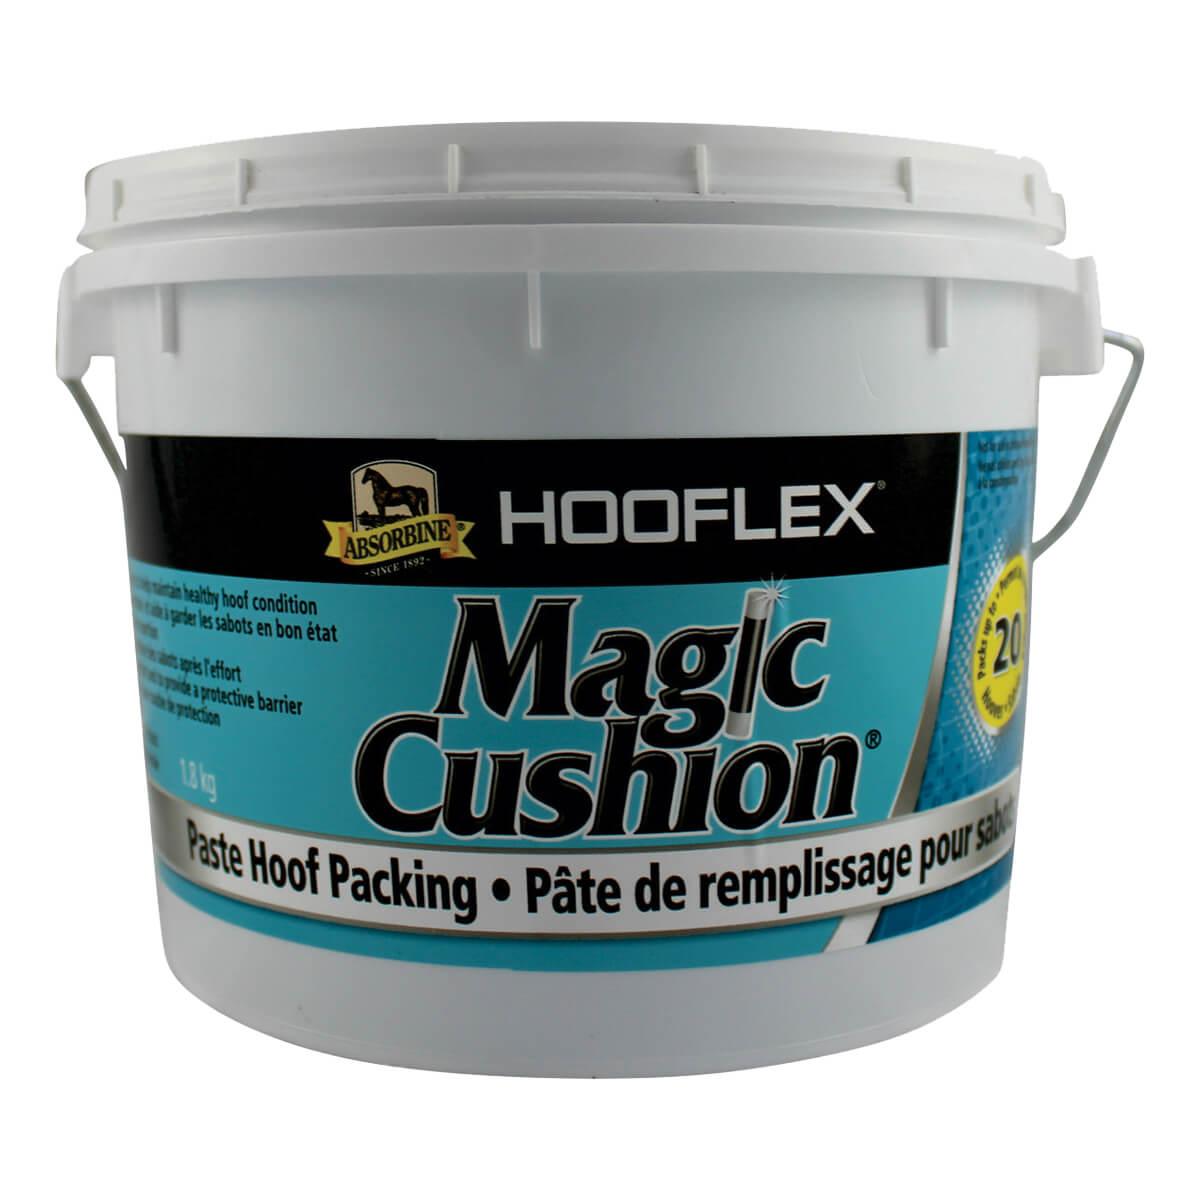 Absorbine Magic Cushion Hoof Packing - 1.8 kg